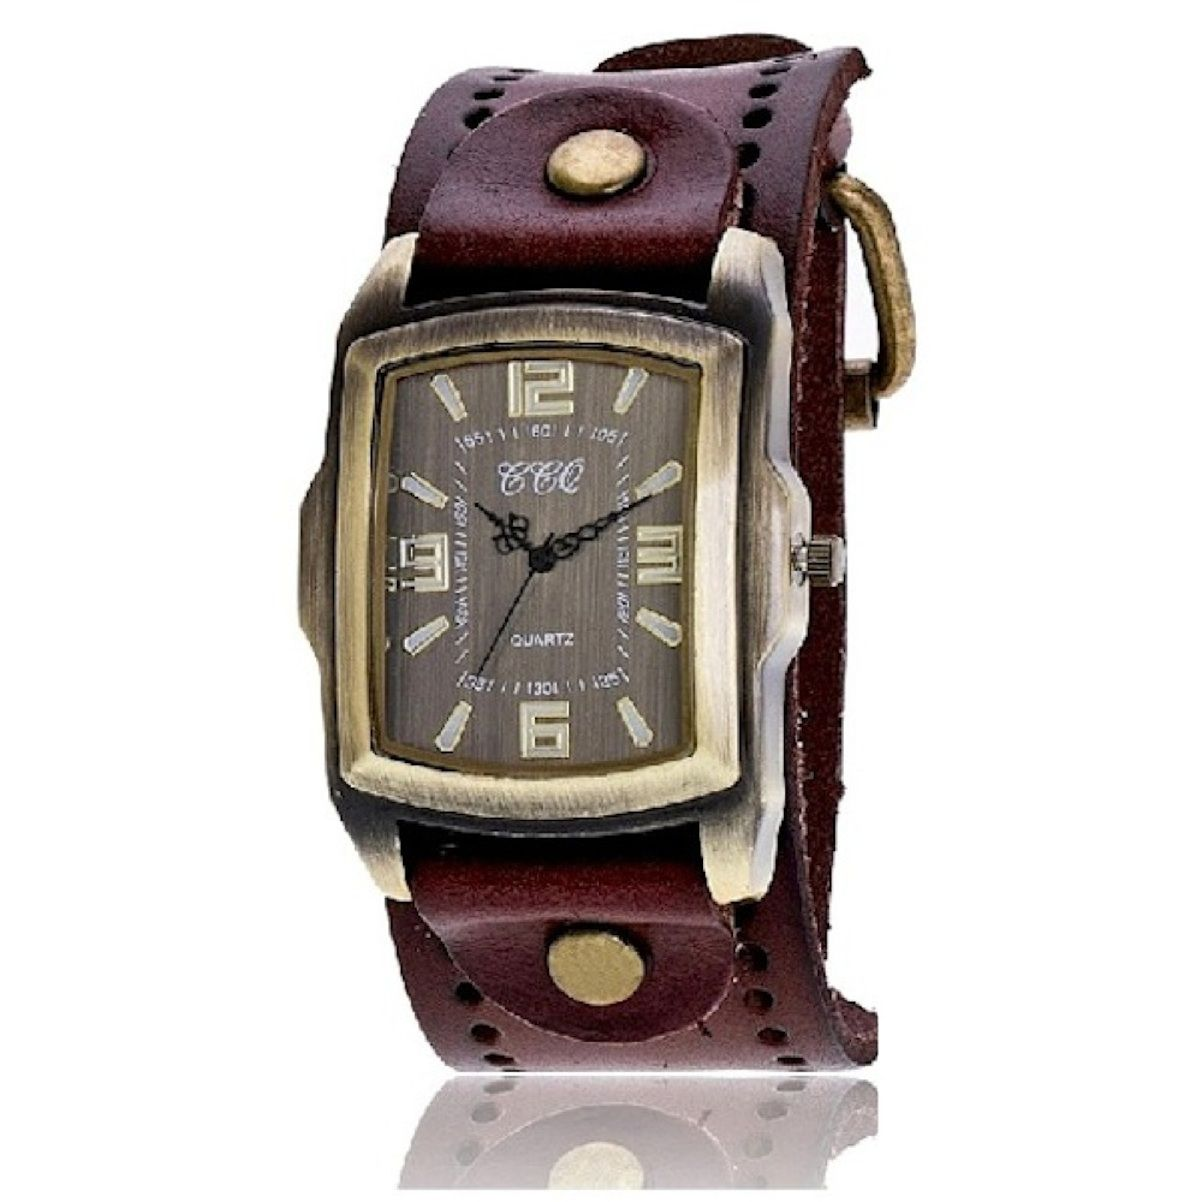 Relógio Masculino classico pulseira De Couro Vintage Retrô